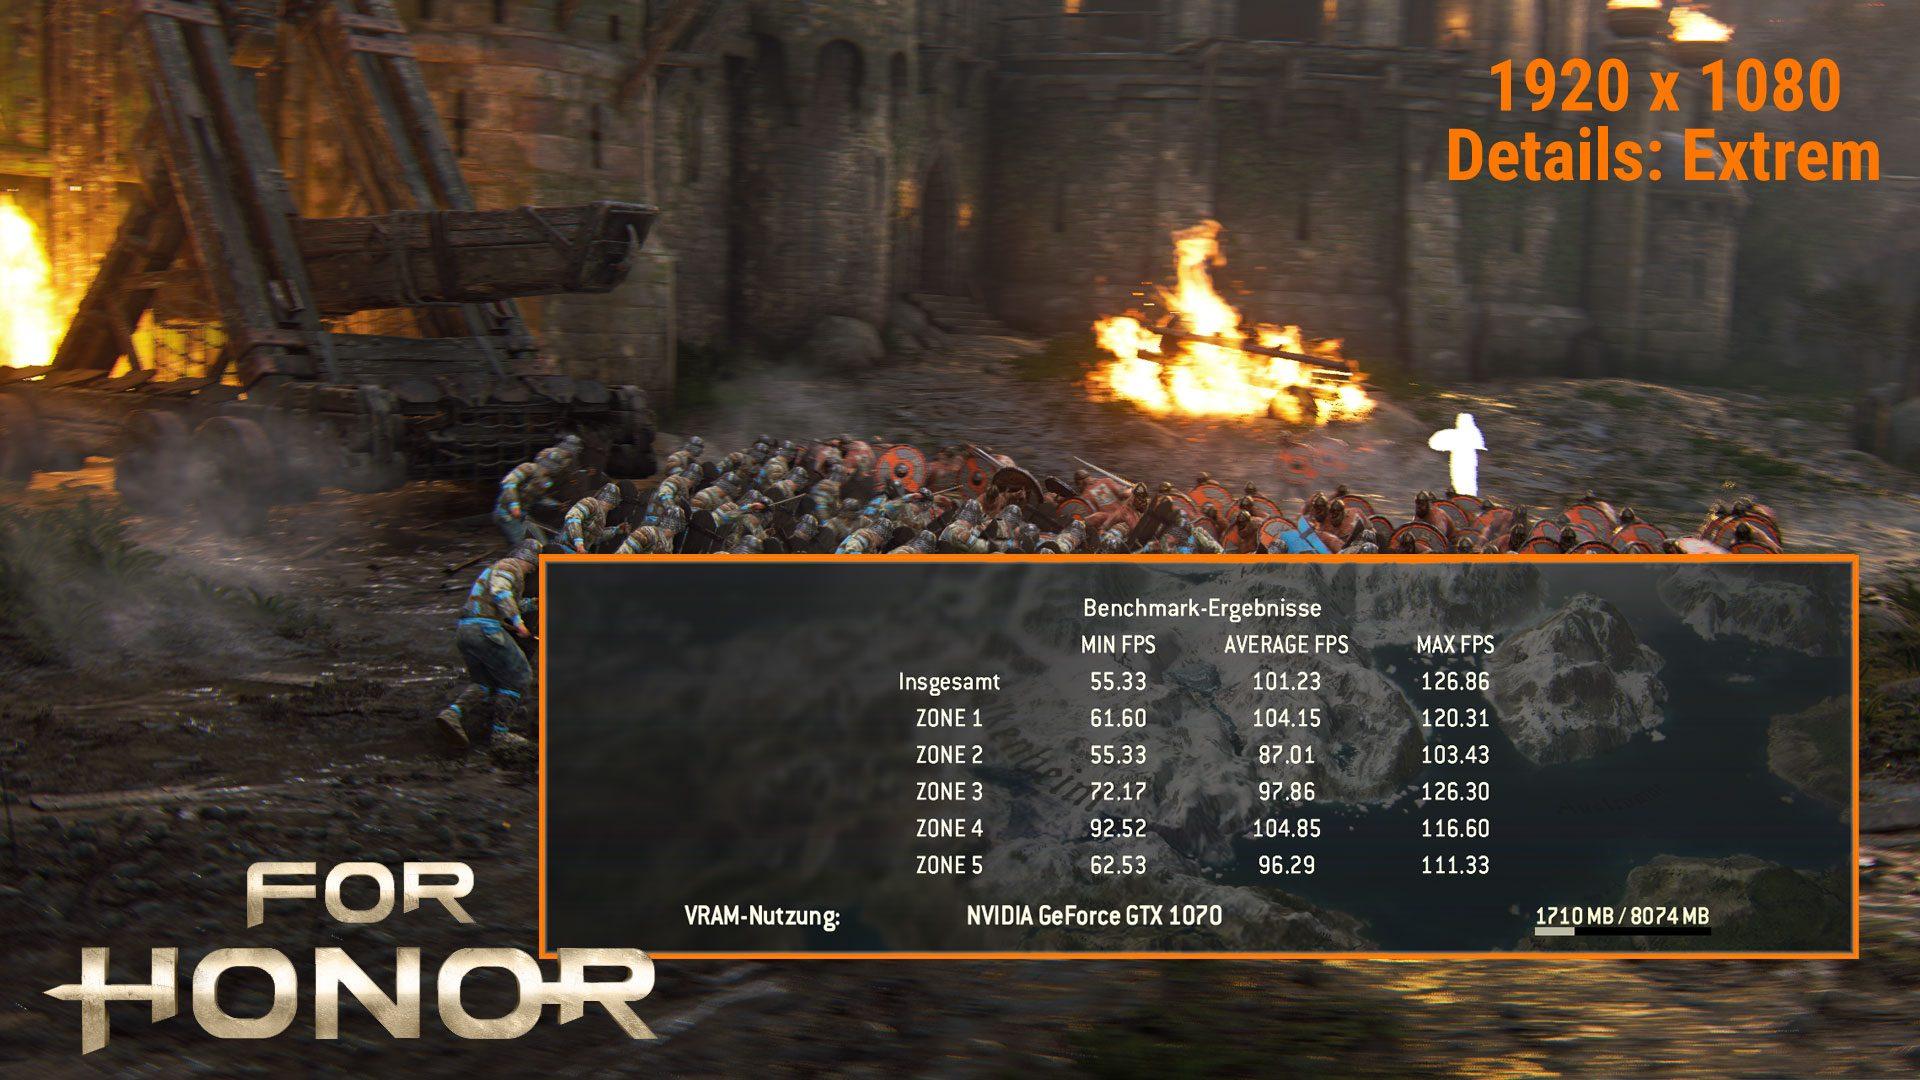 Acer-Predator-17-G9-793-718-Games-7